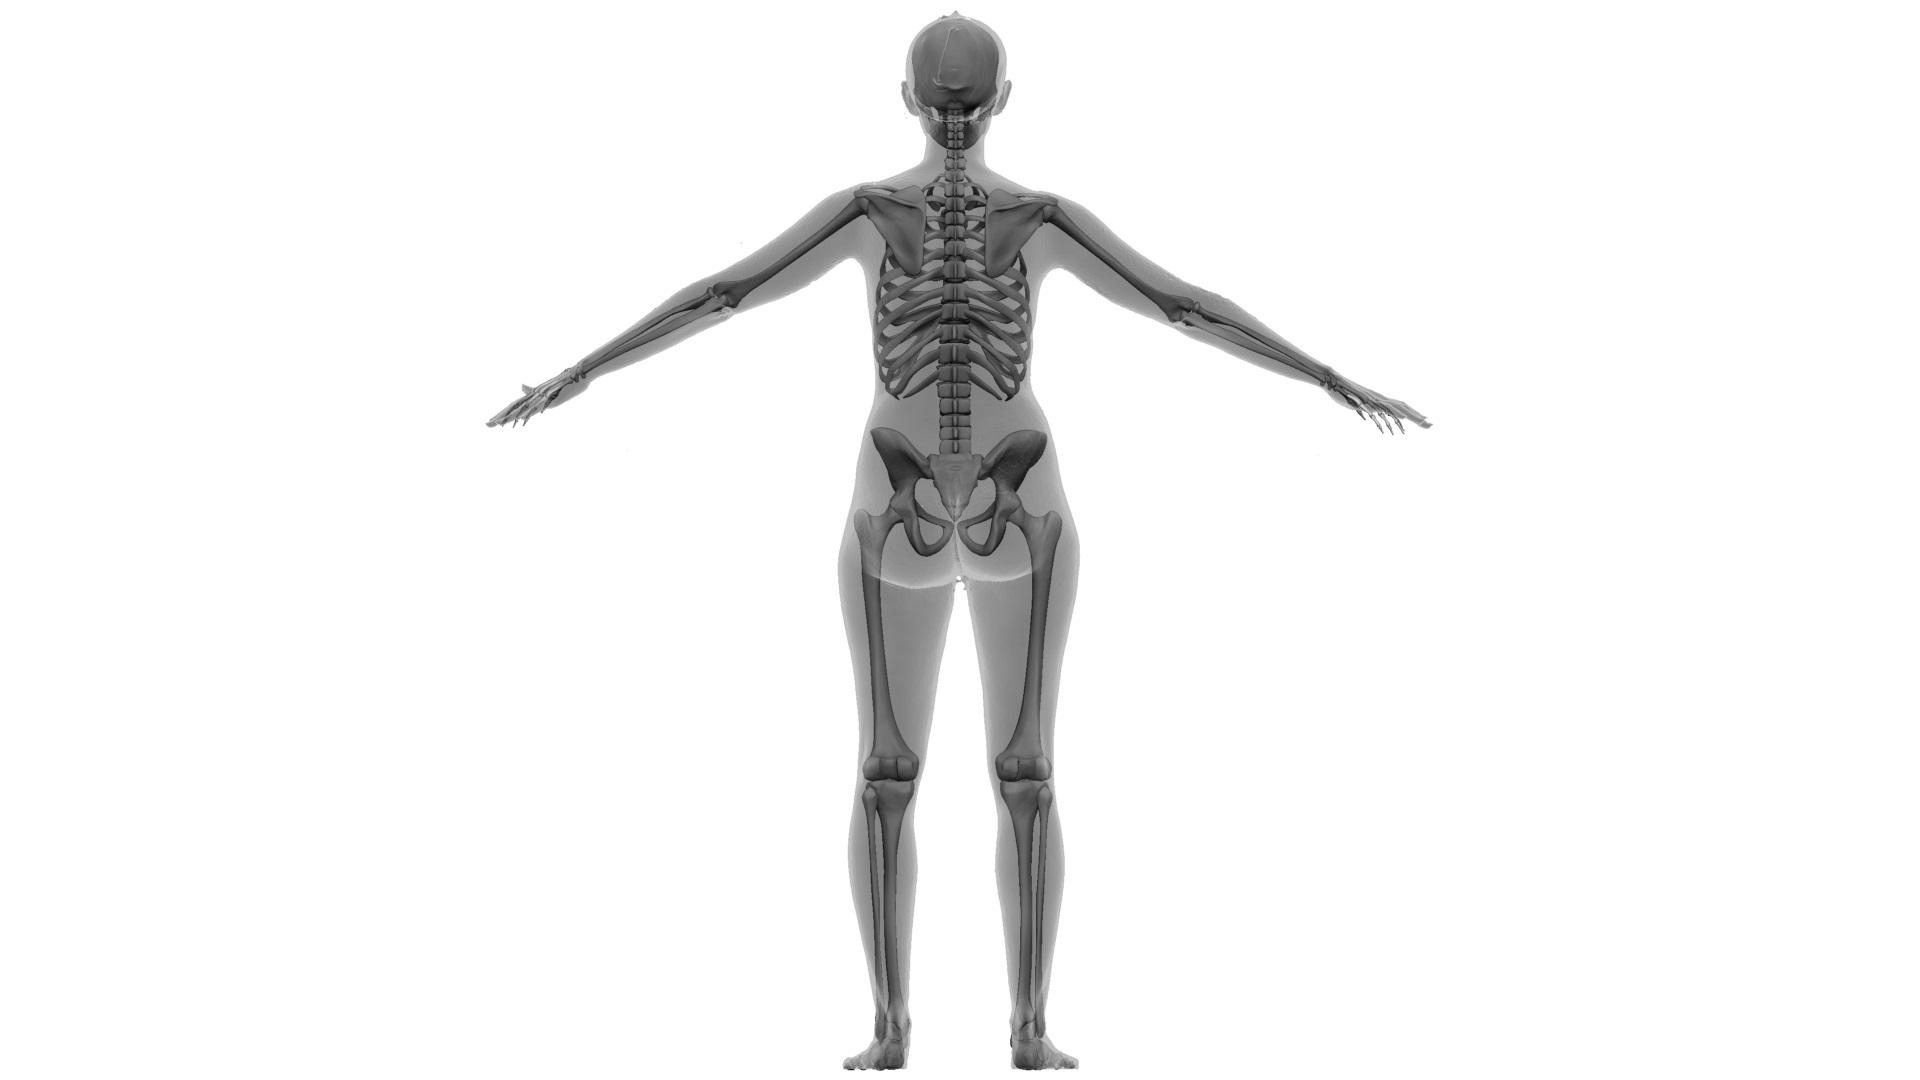 Ian_Nakamoto_Mel_Keiser_Skeleton_render_2